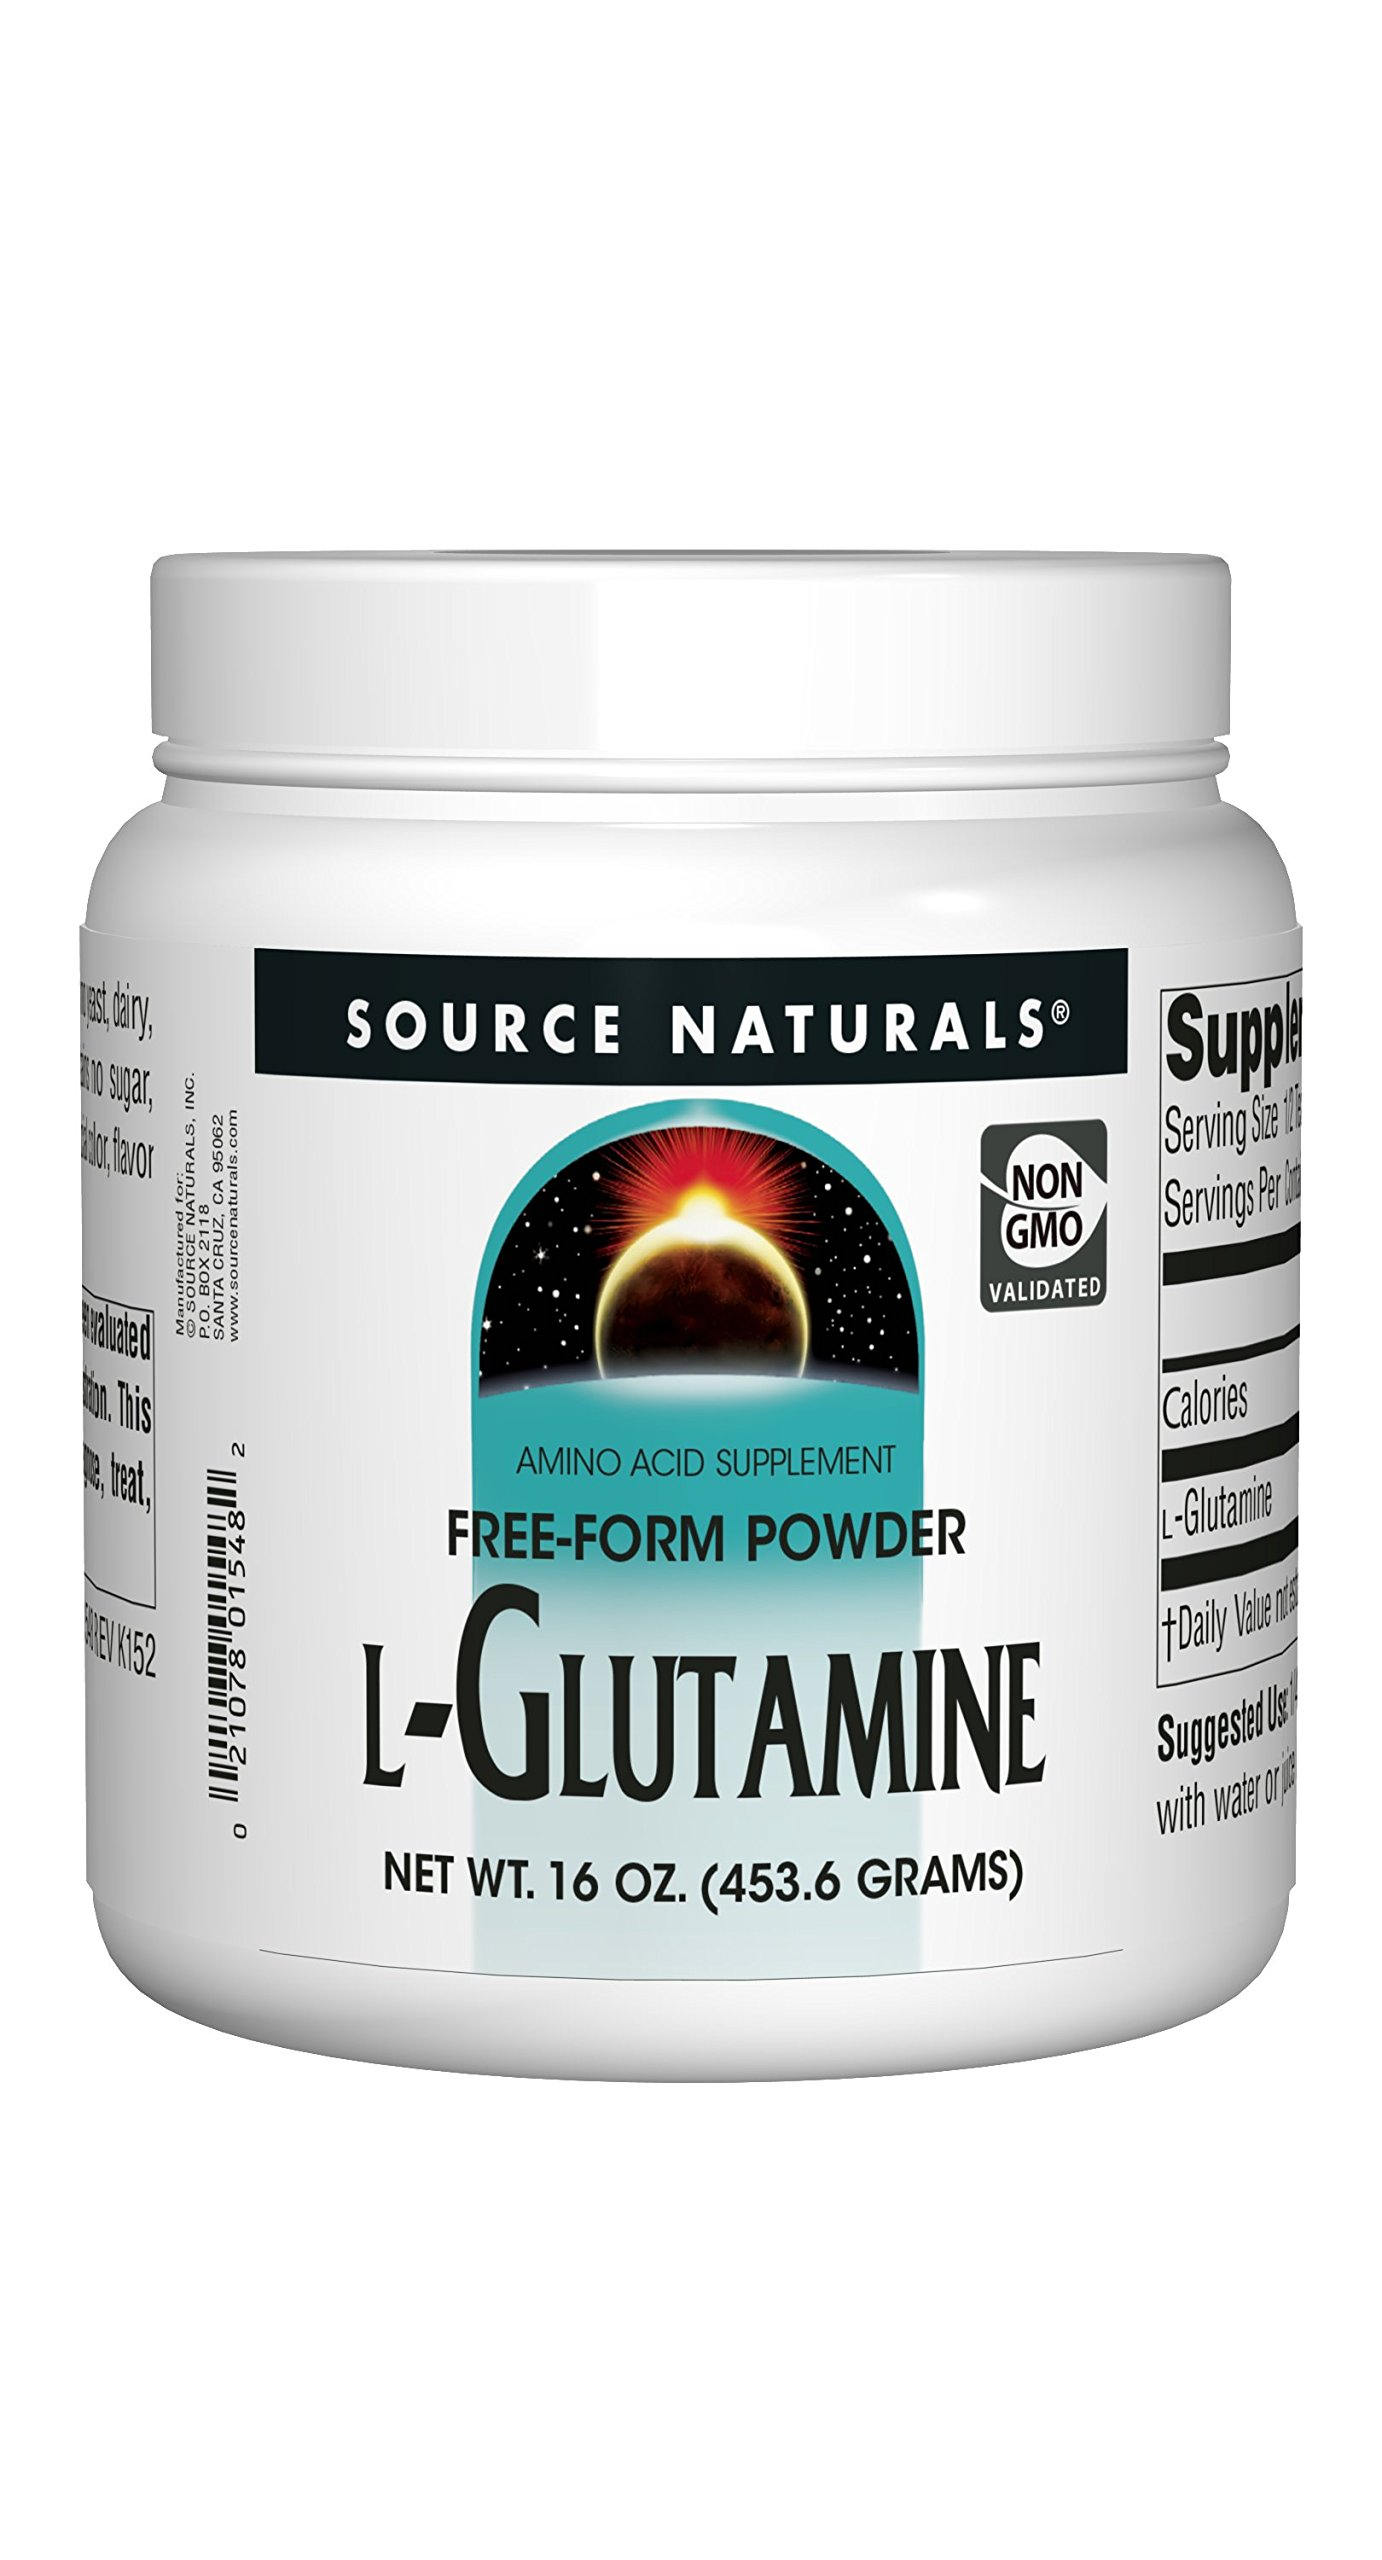 Source Naturals L-Glutamine Powder - Protein Synthesis Free Form Amino Acid - 16 oz